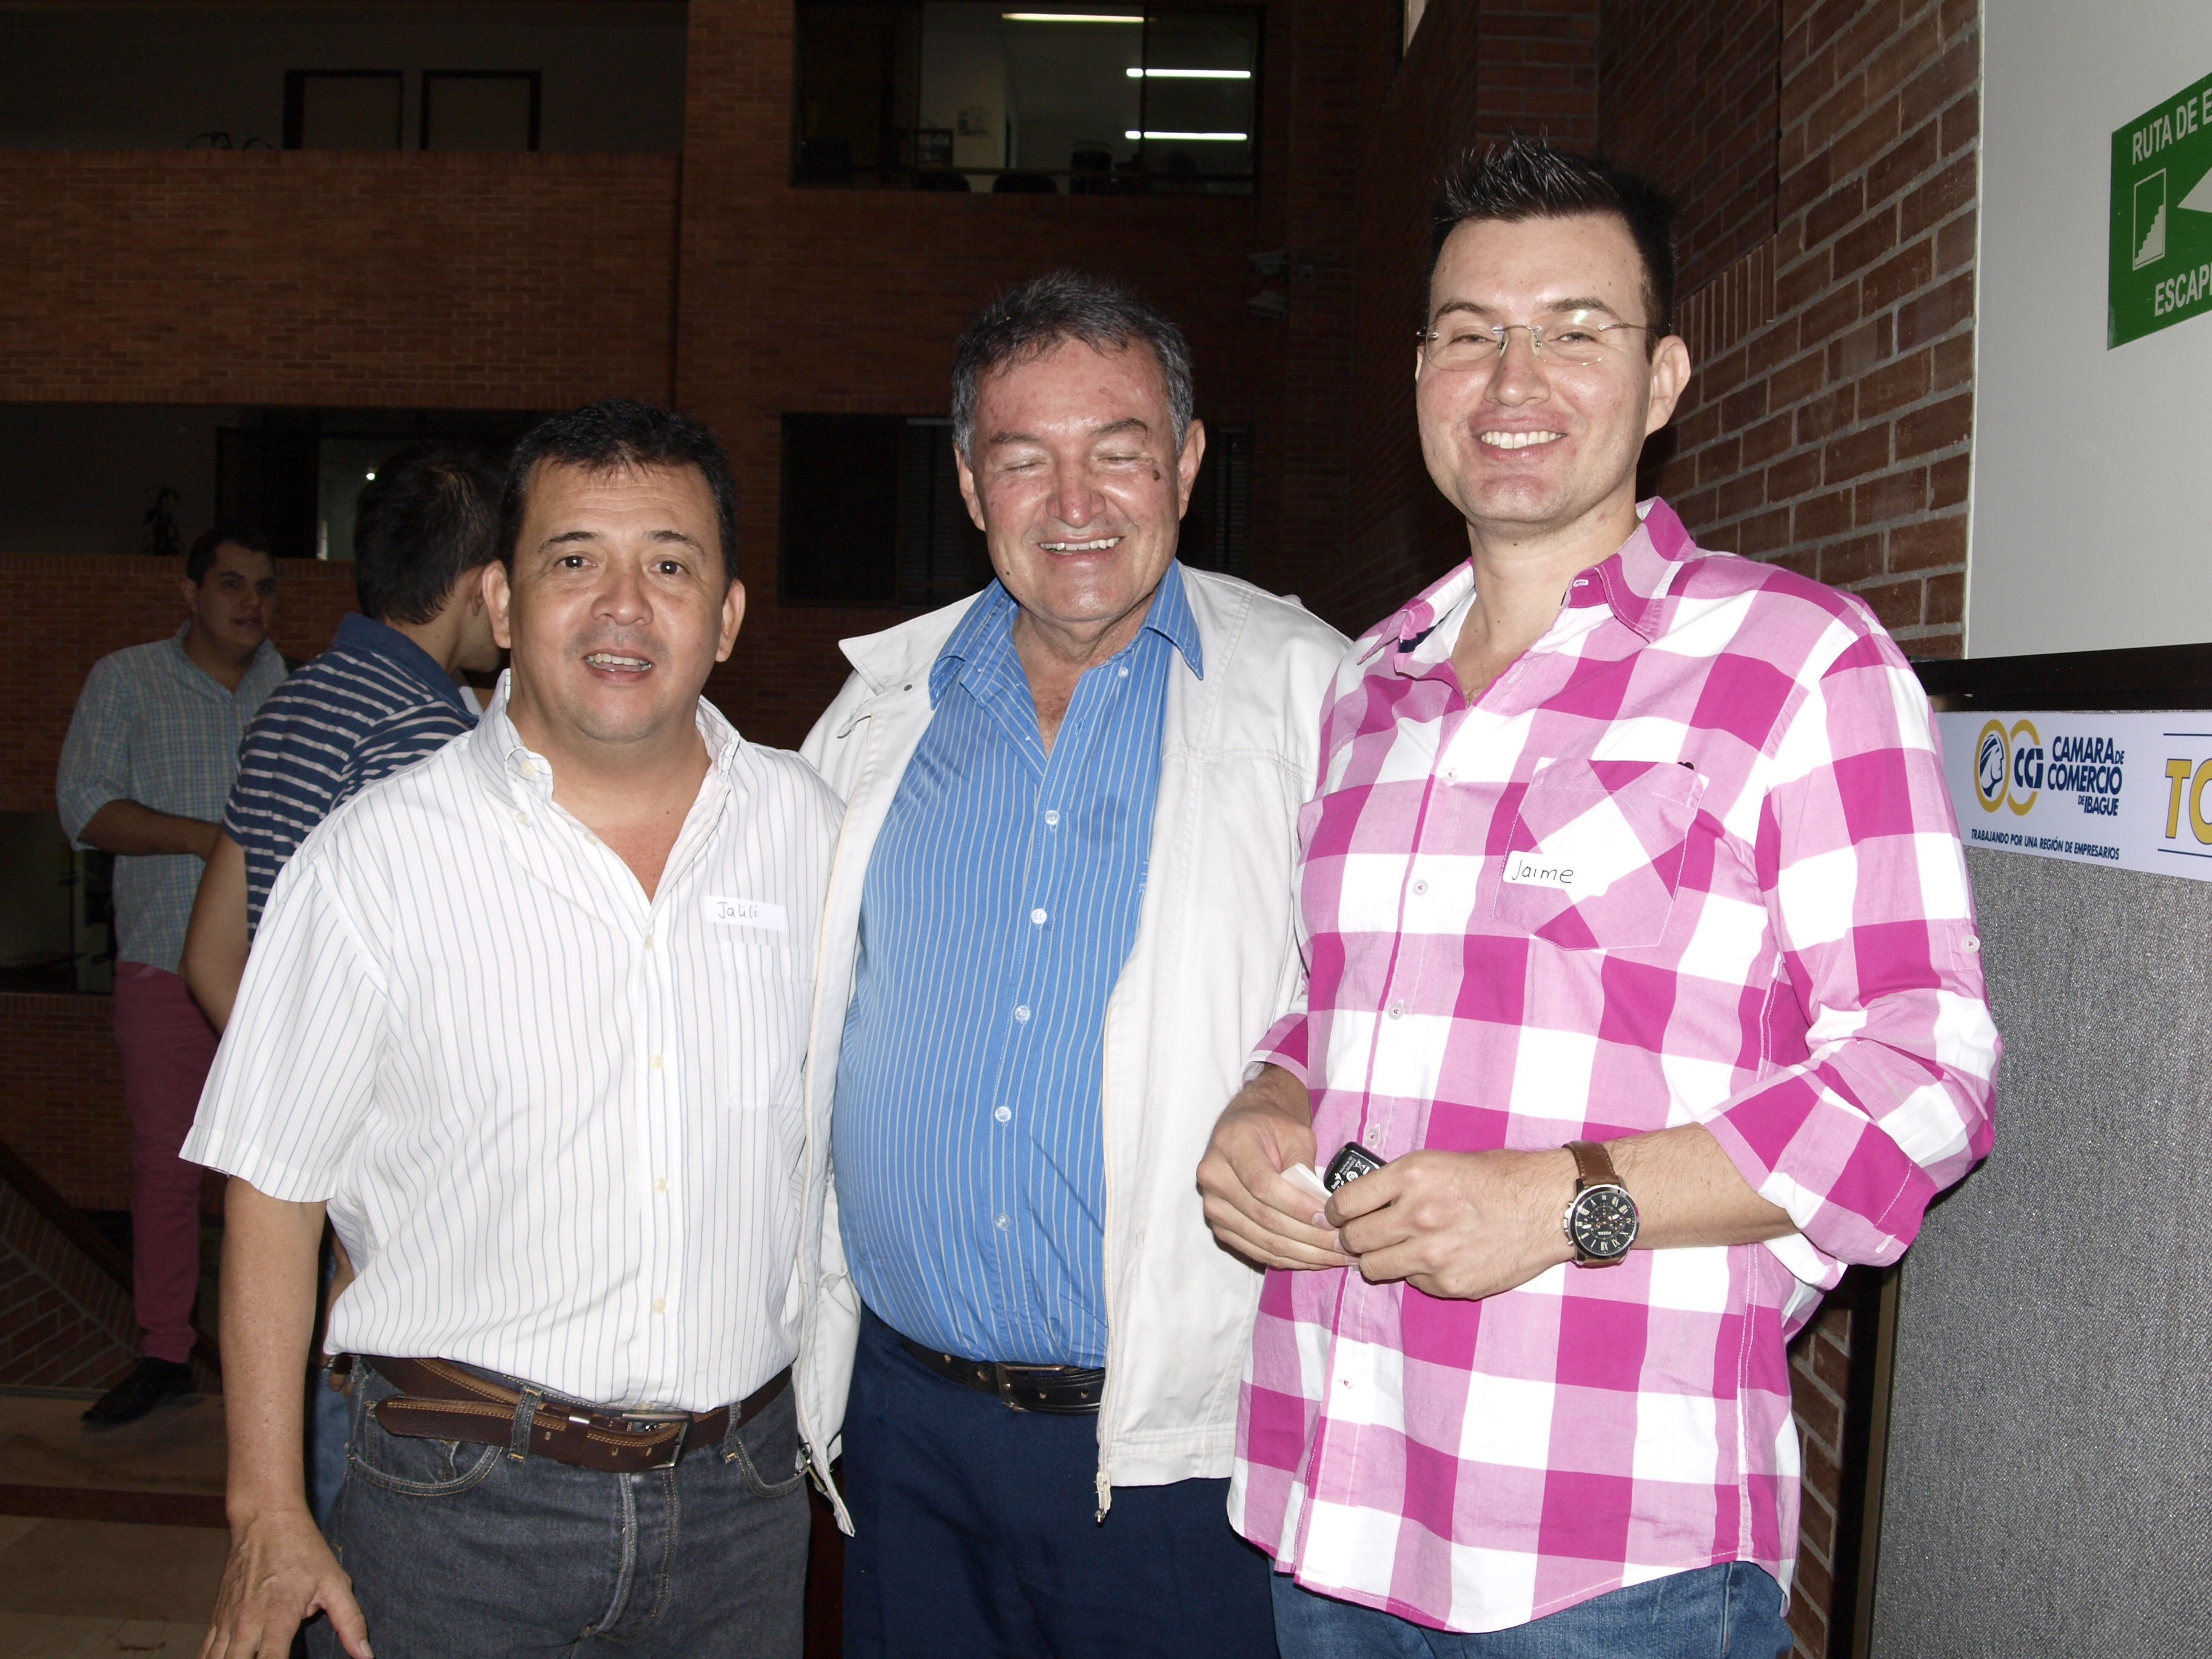 Jaime Penuela asistentes Camara de Comer